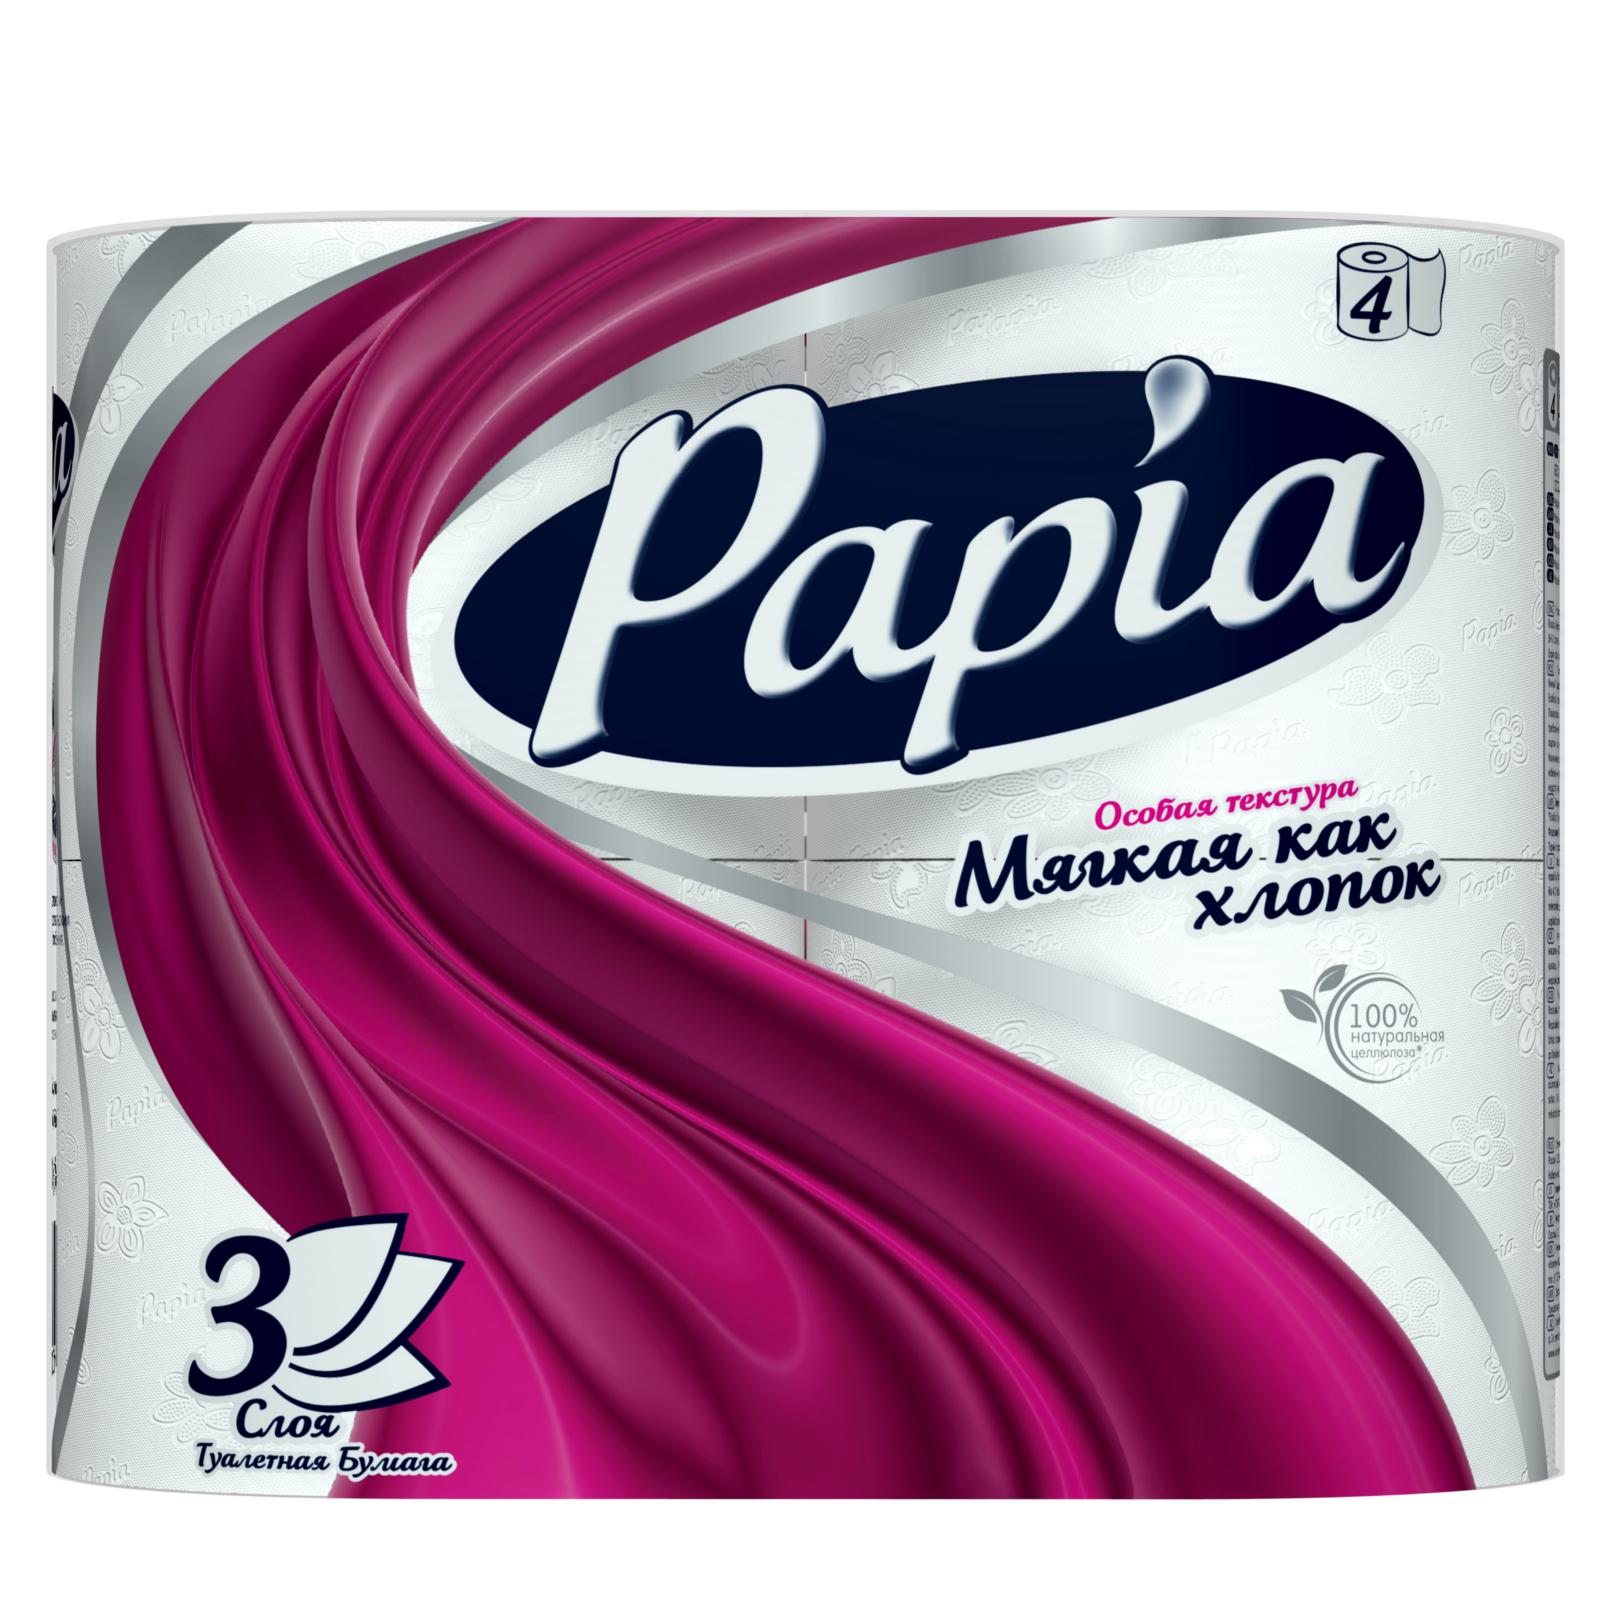 ��������� ������ Papia ����� (3 ����) 4 ��